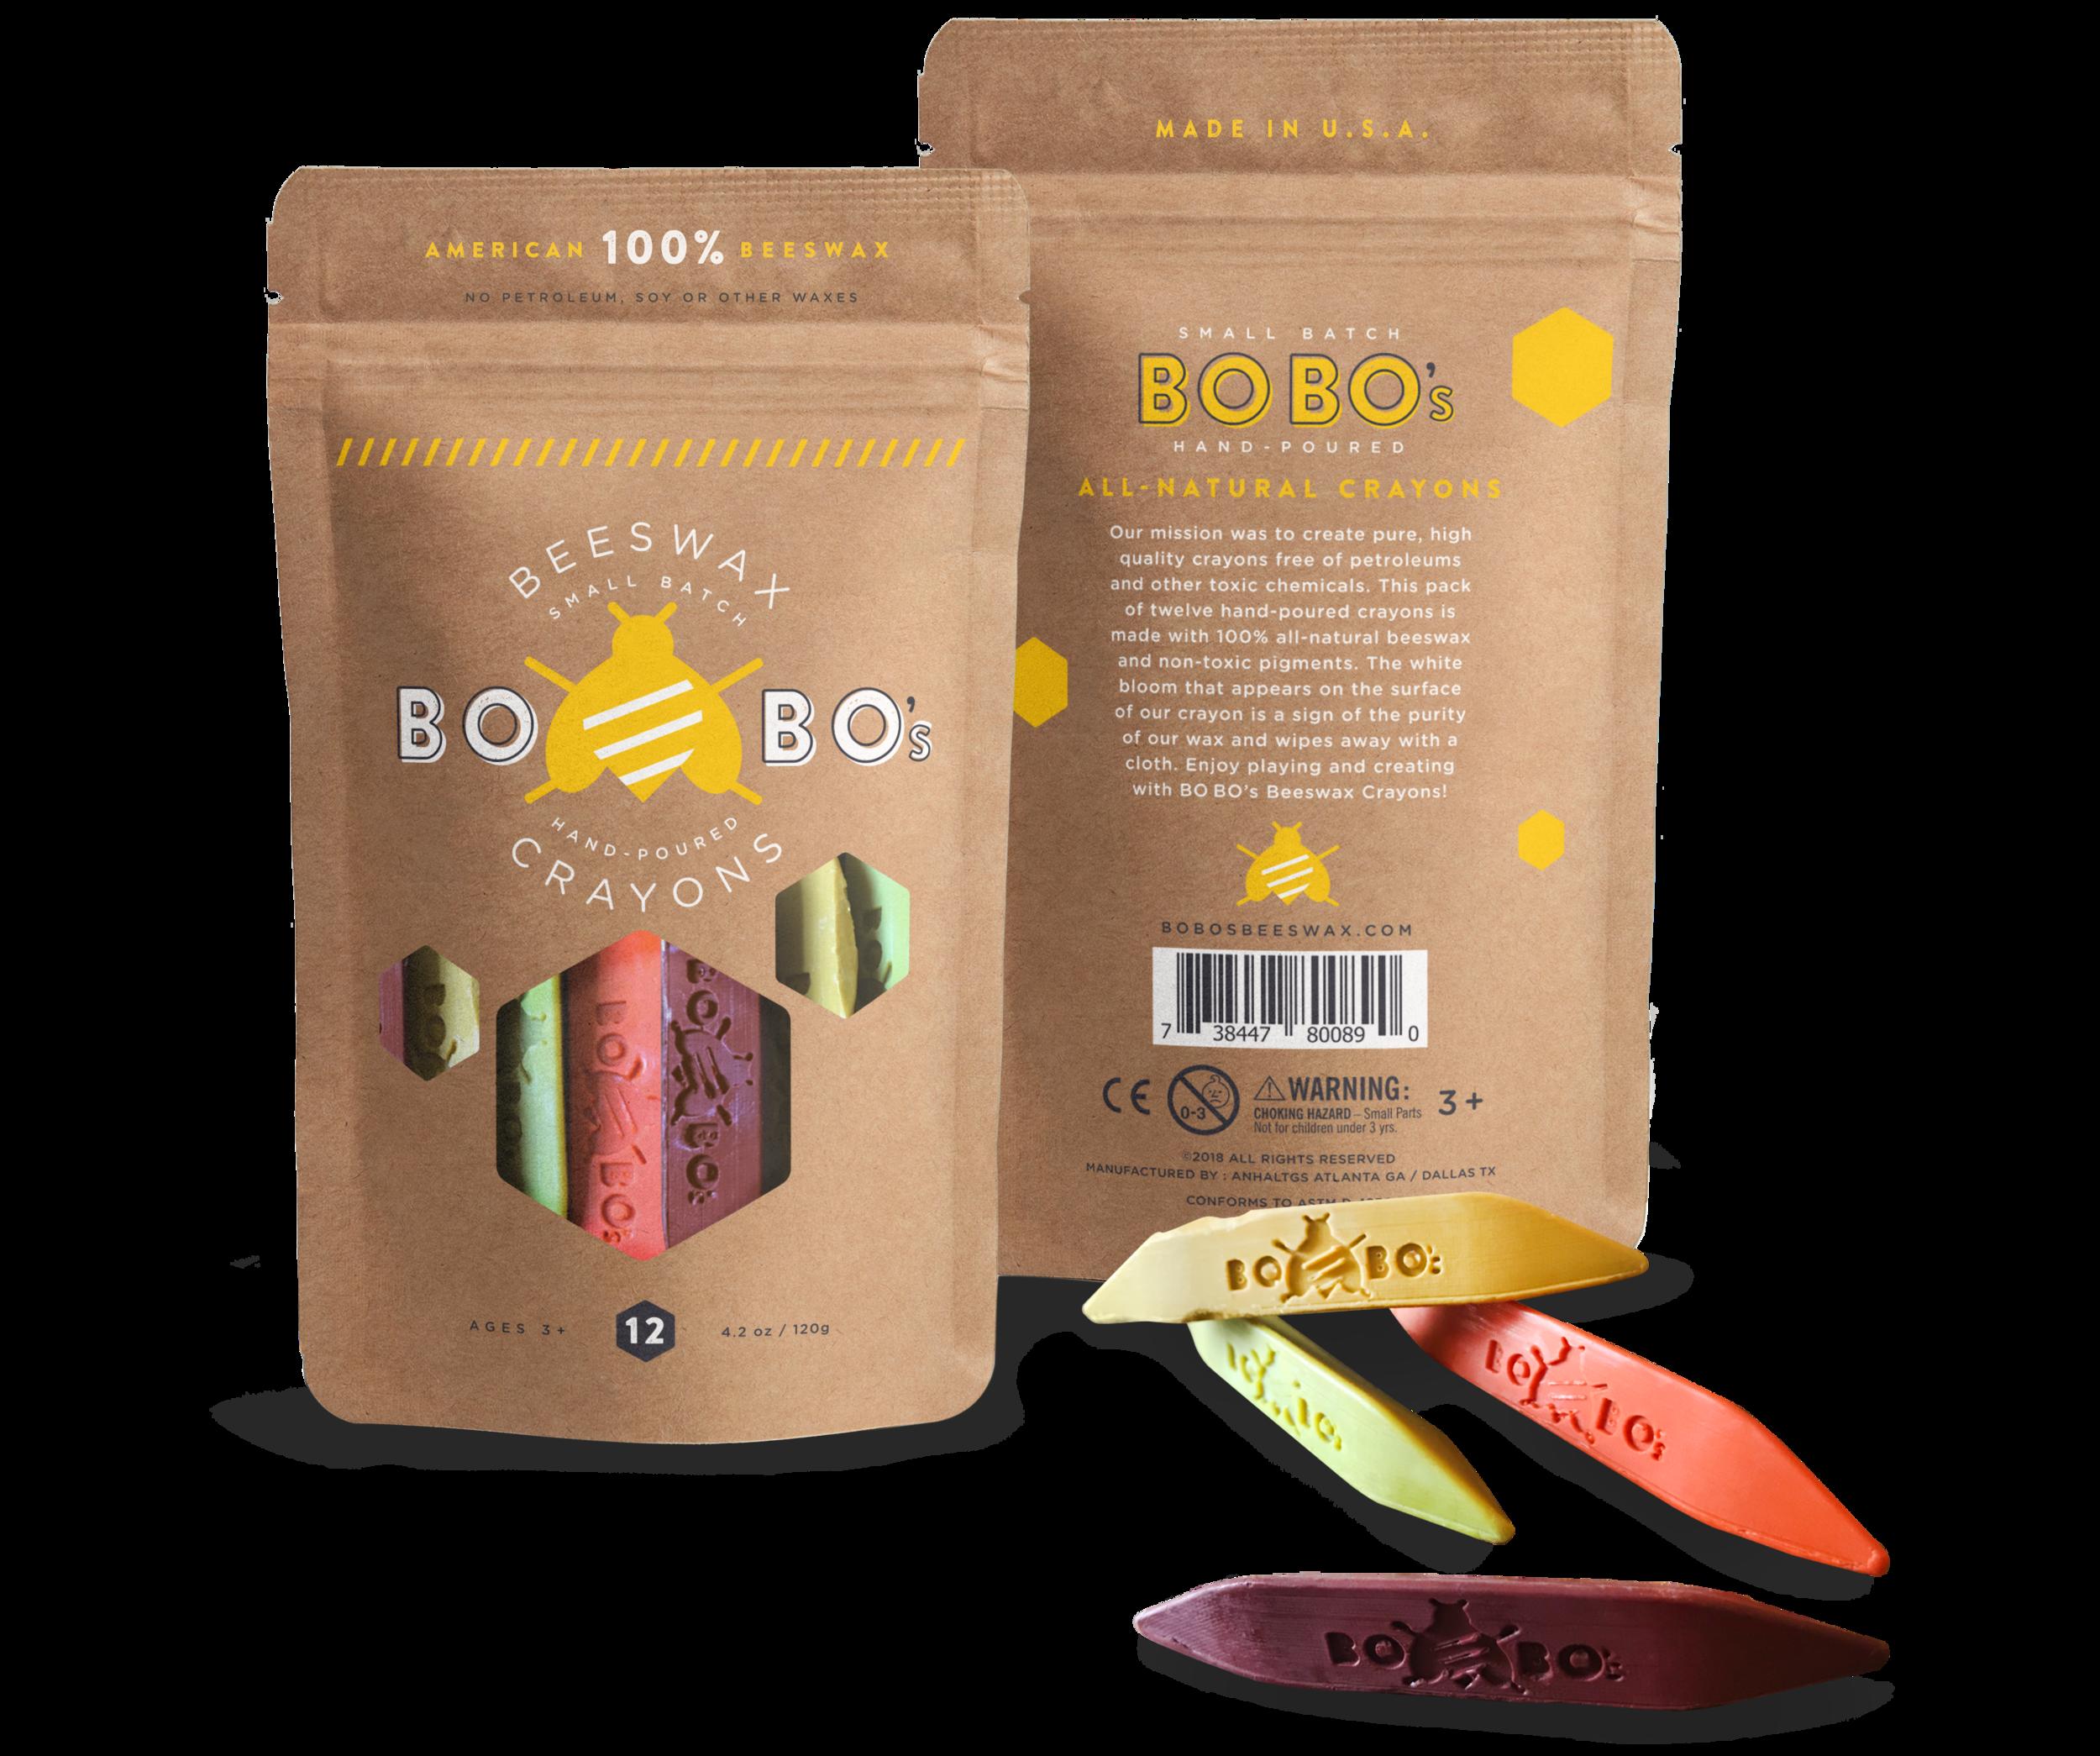 Bo Bo's Beeswax Crayons _ Funnel.tv | Eric Kass